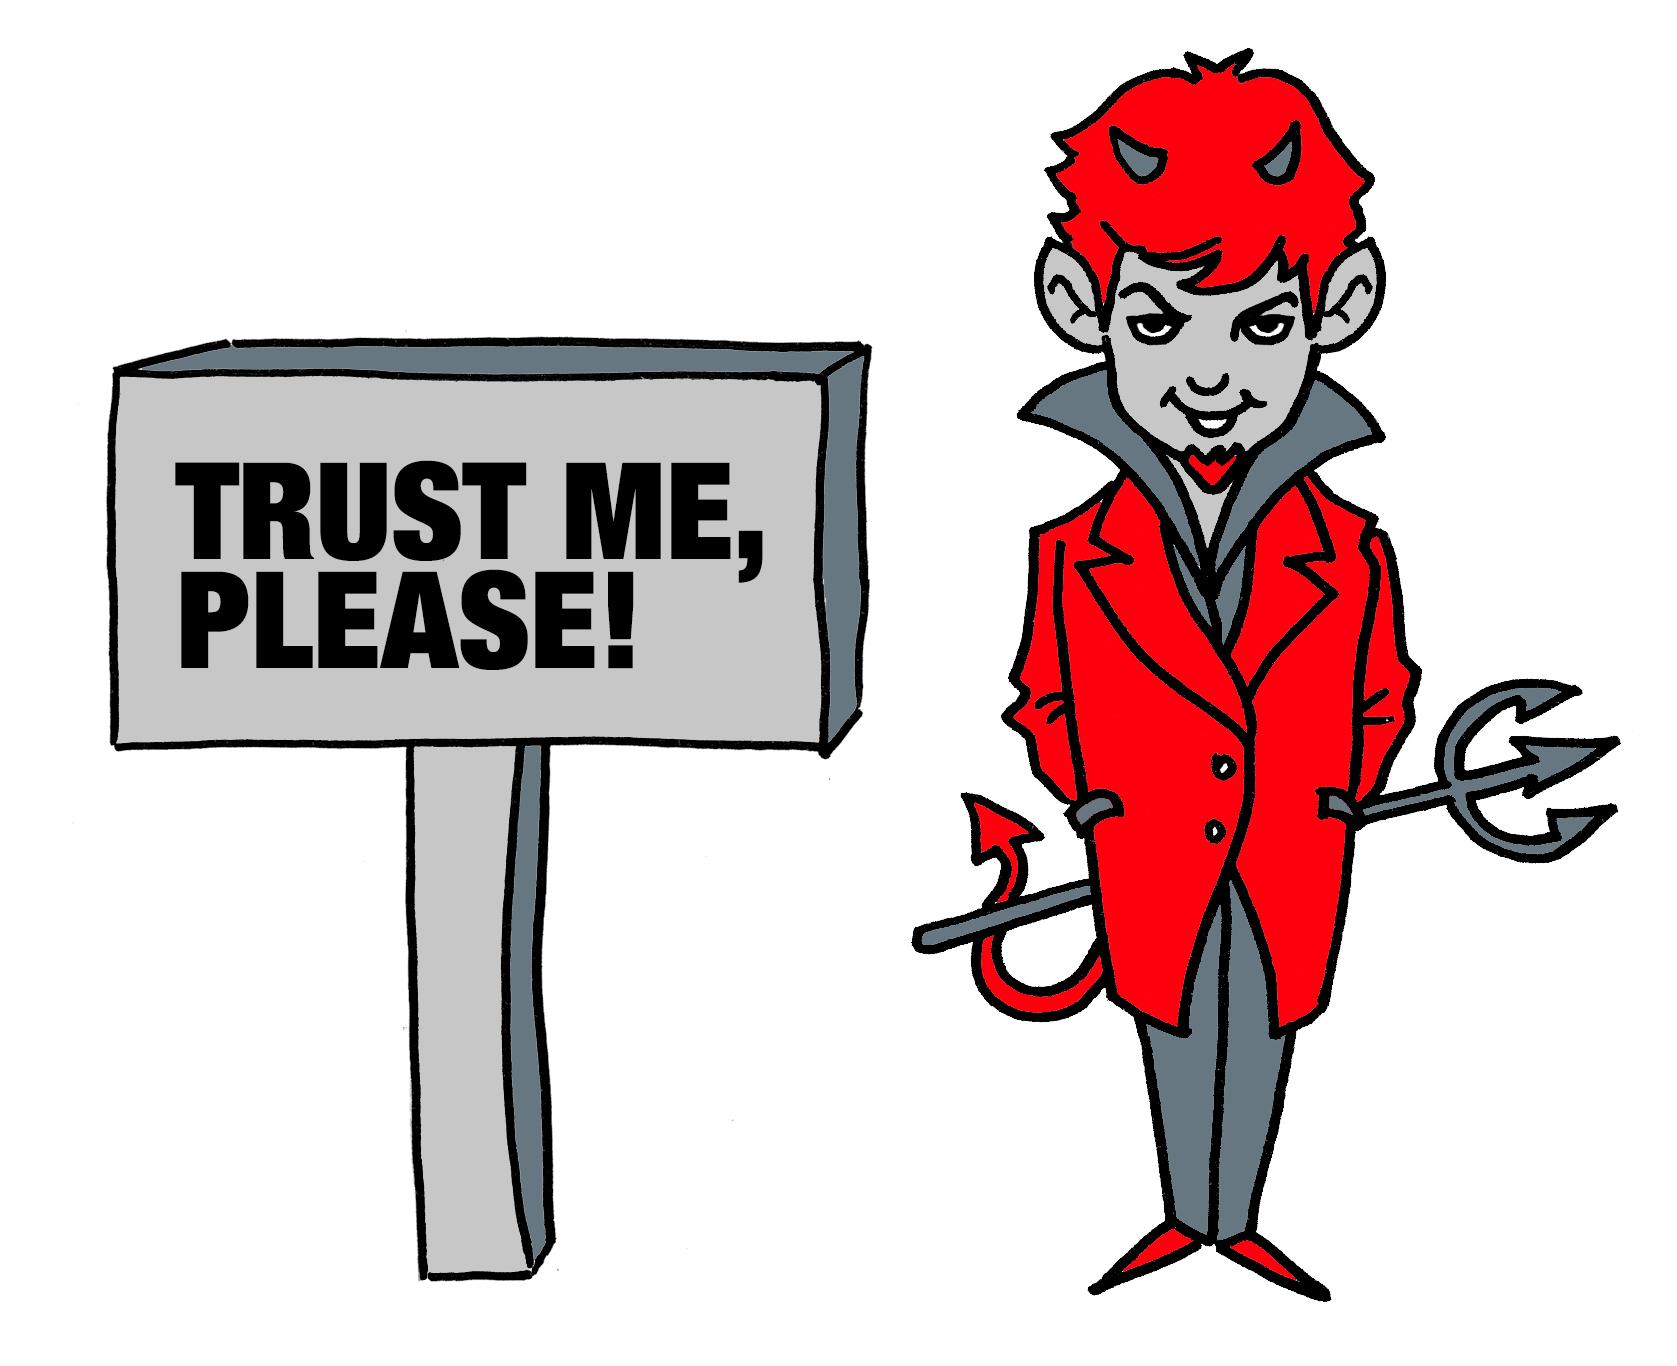 trust me please